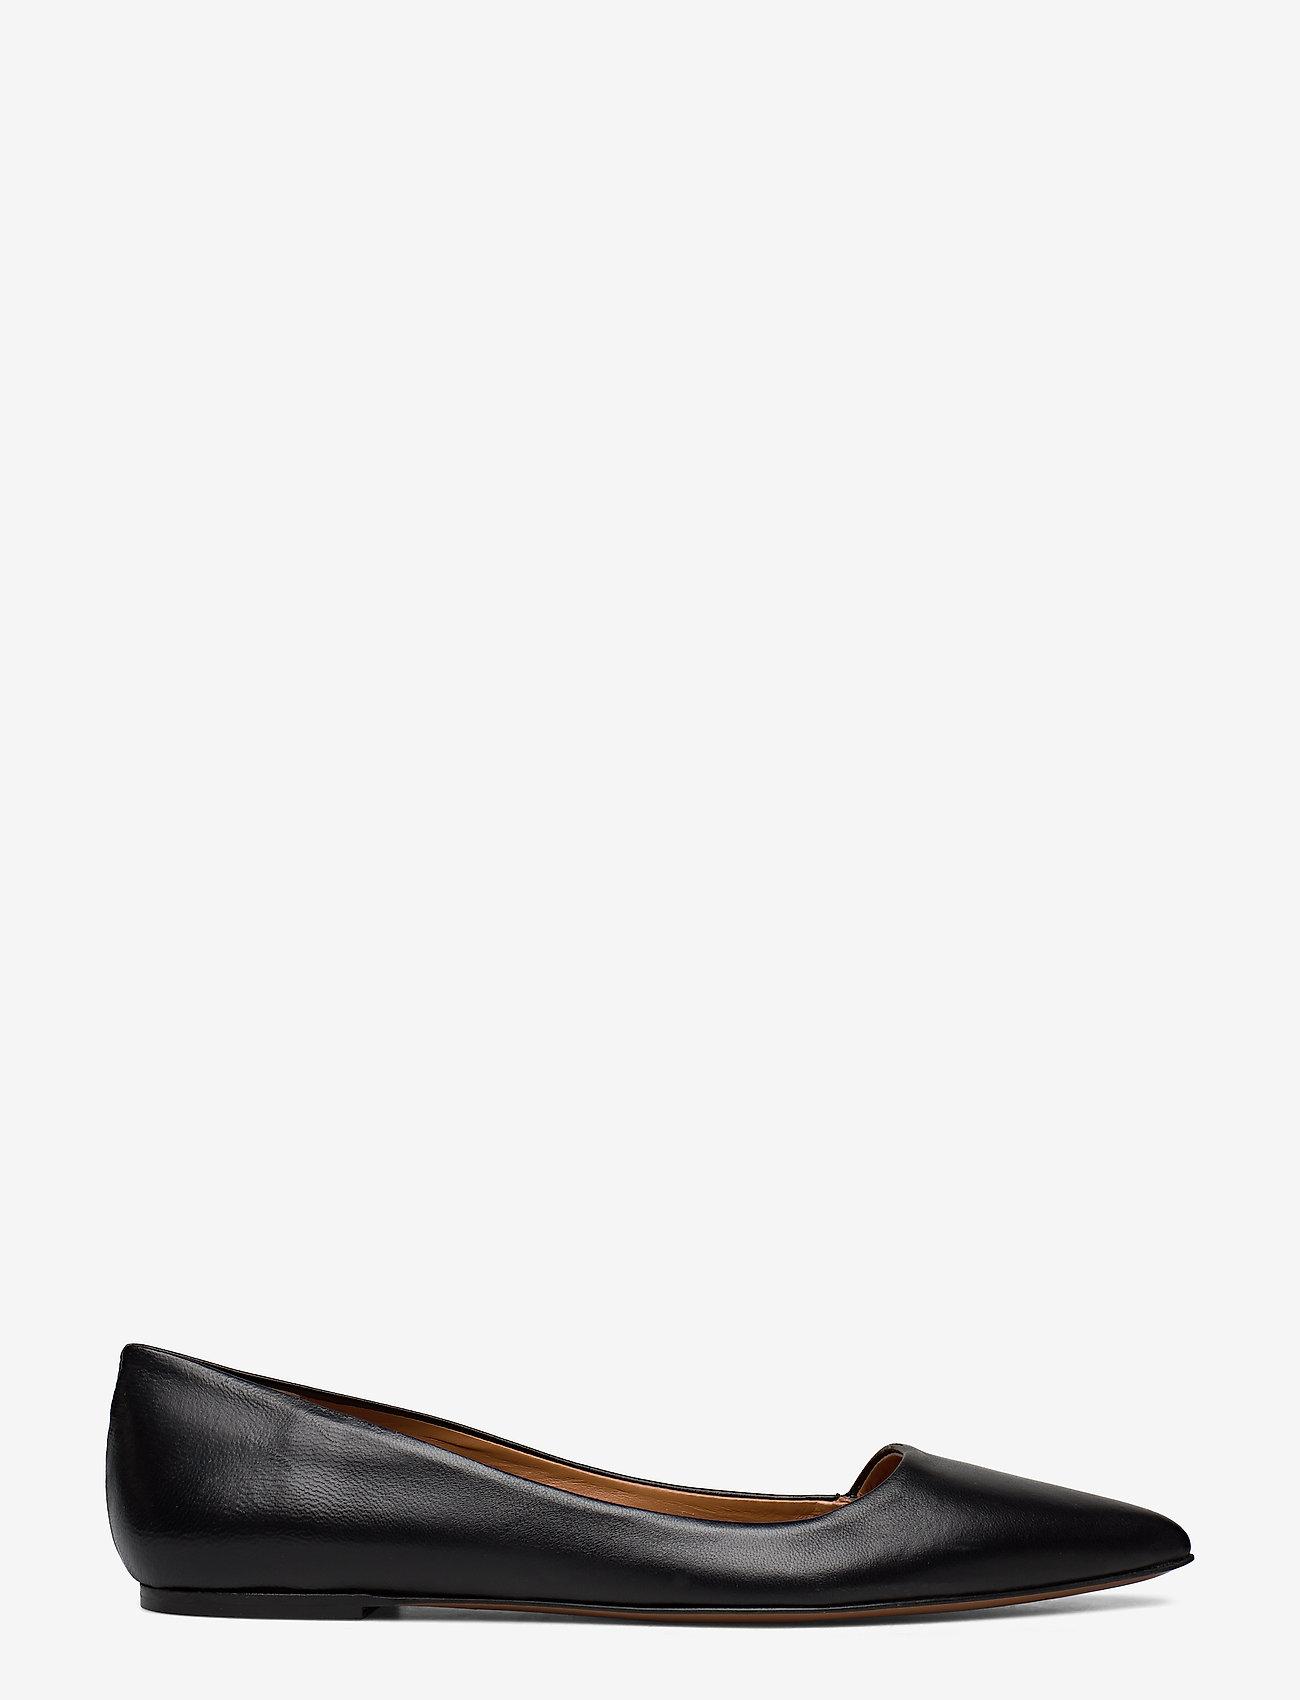 ATP Atelier - San Cataldo Black Nappa - shoes - black - 1